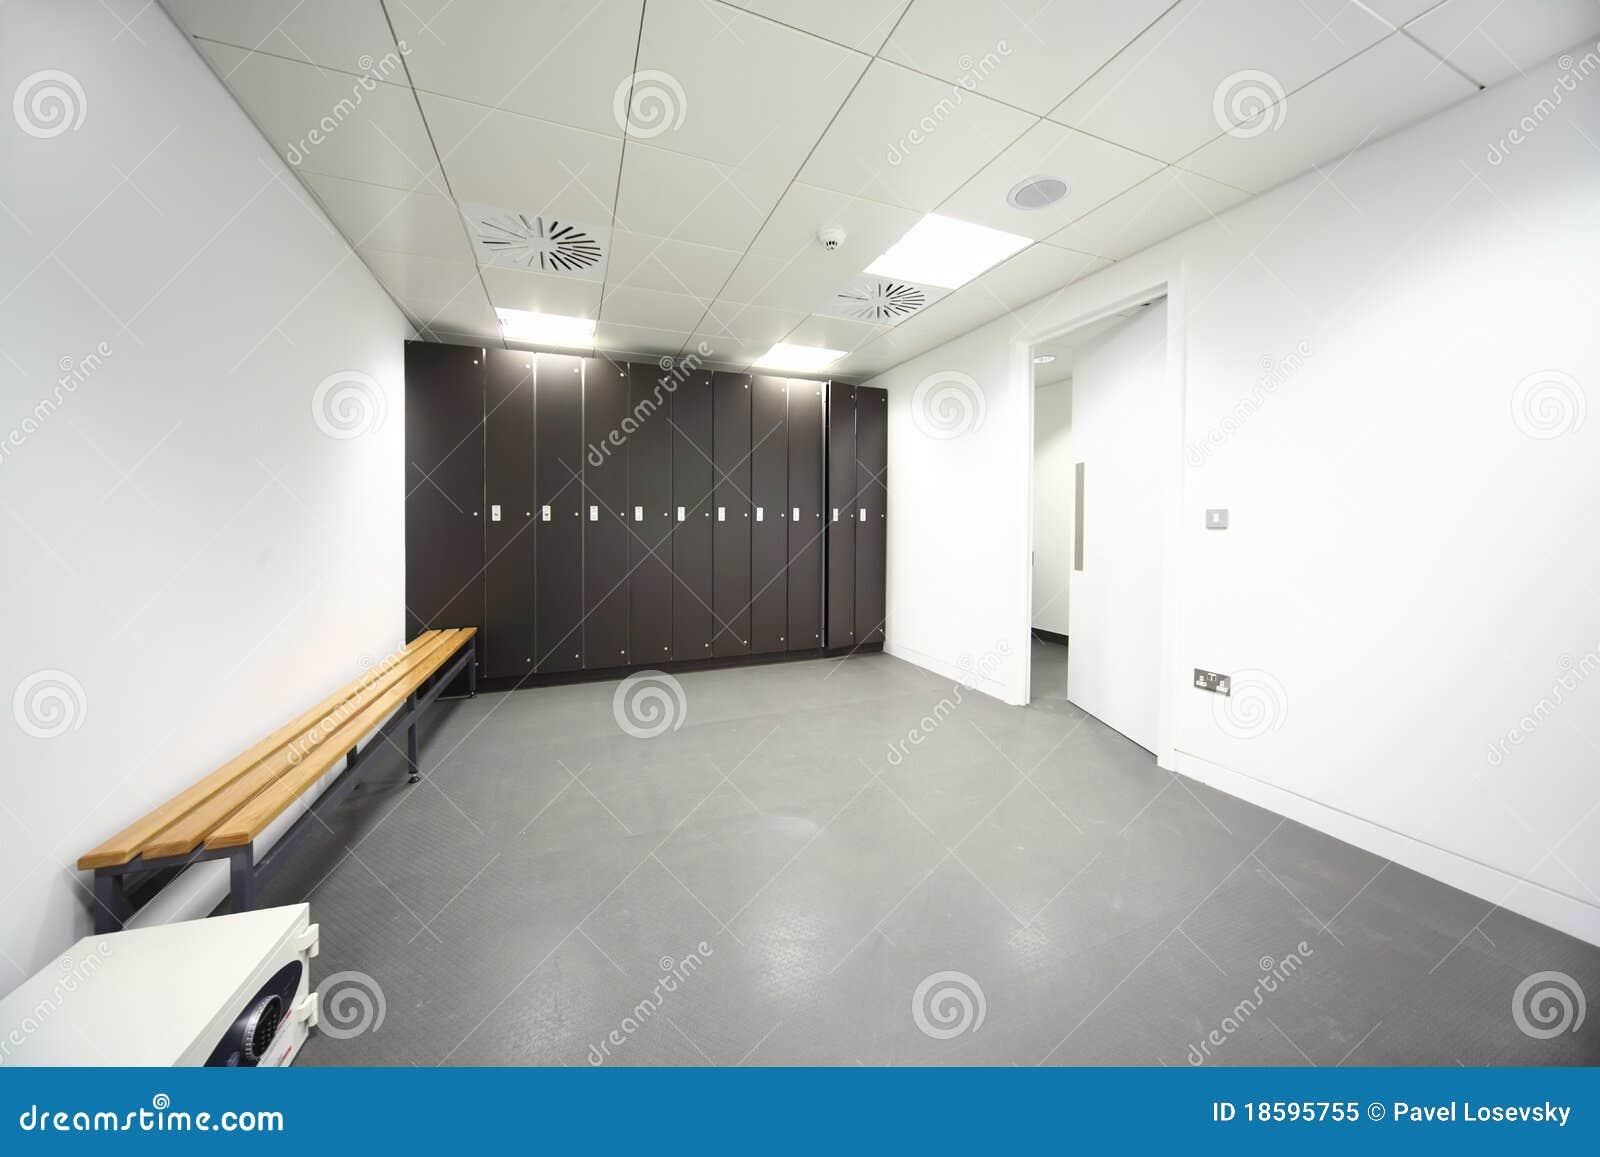 Grote schone ruimte stock afbeelding afbeelding bestaande uit meetkunde 18595755 - Grote kleedkamer ...